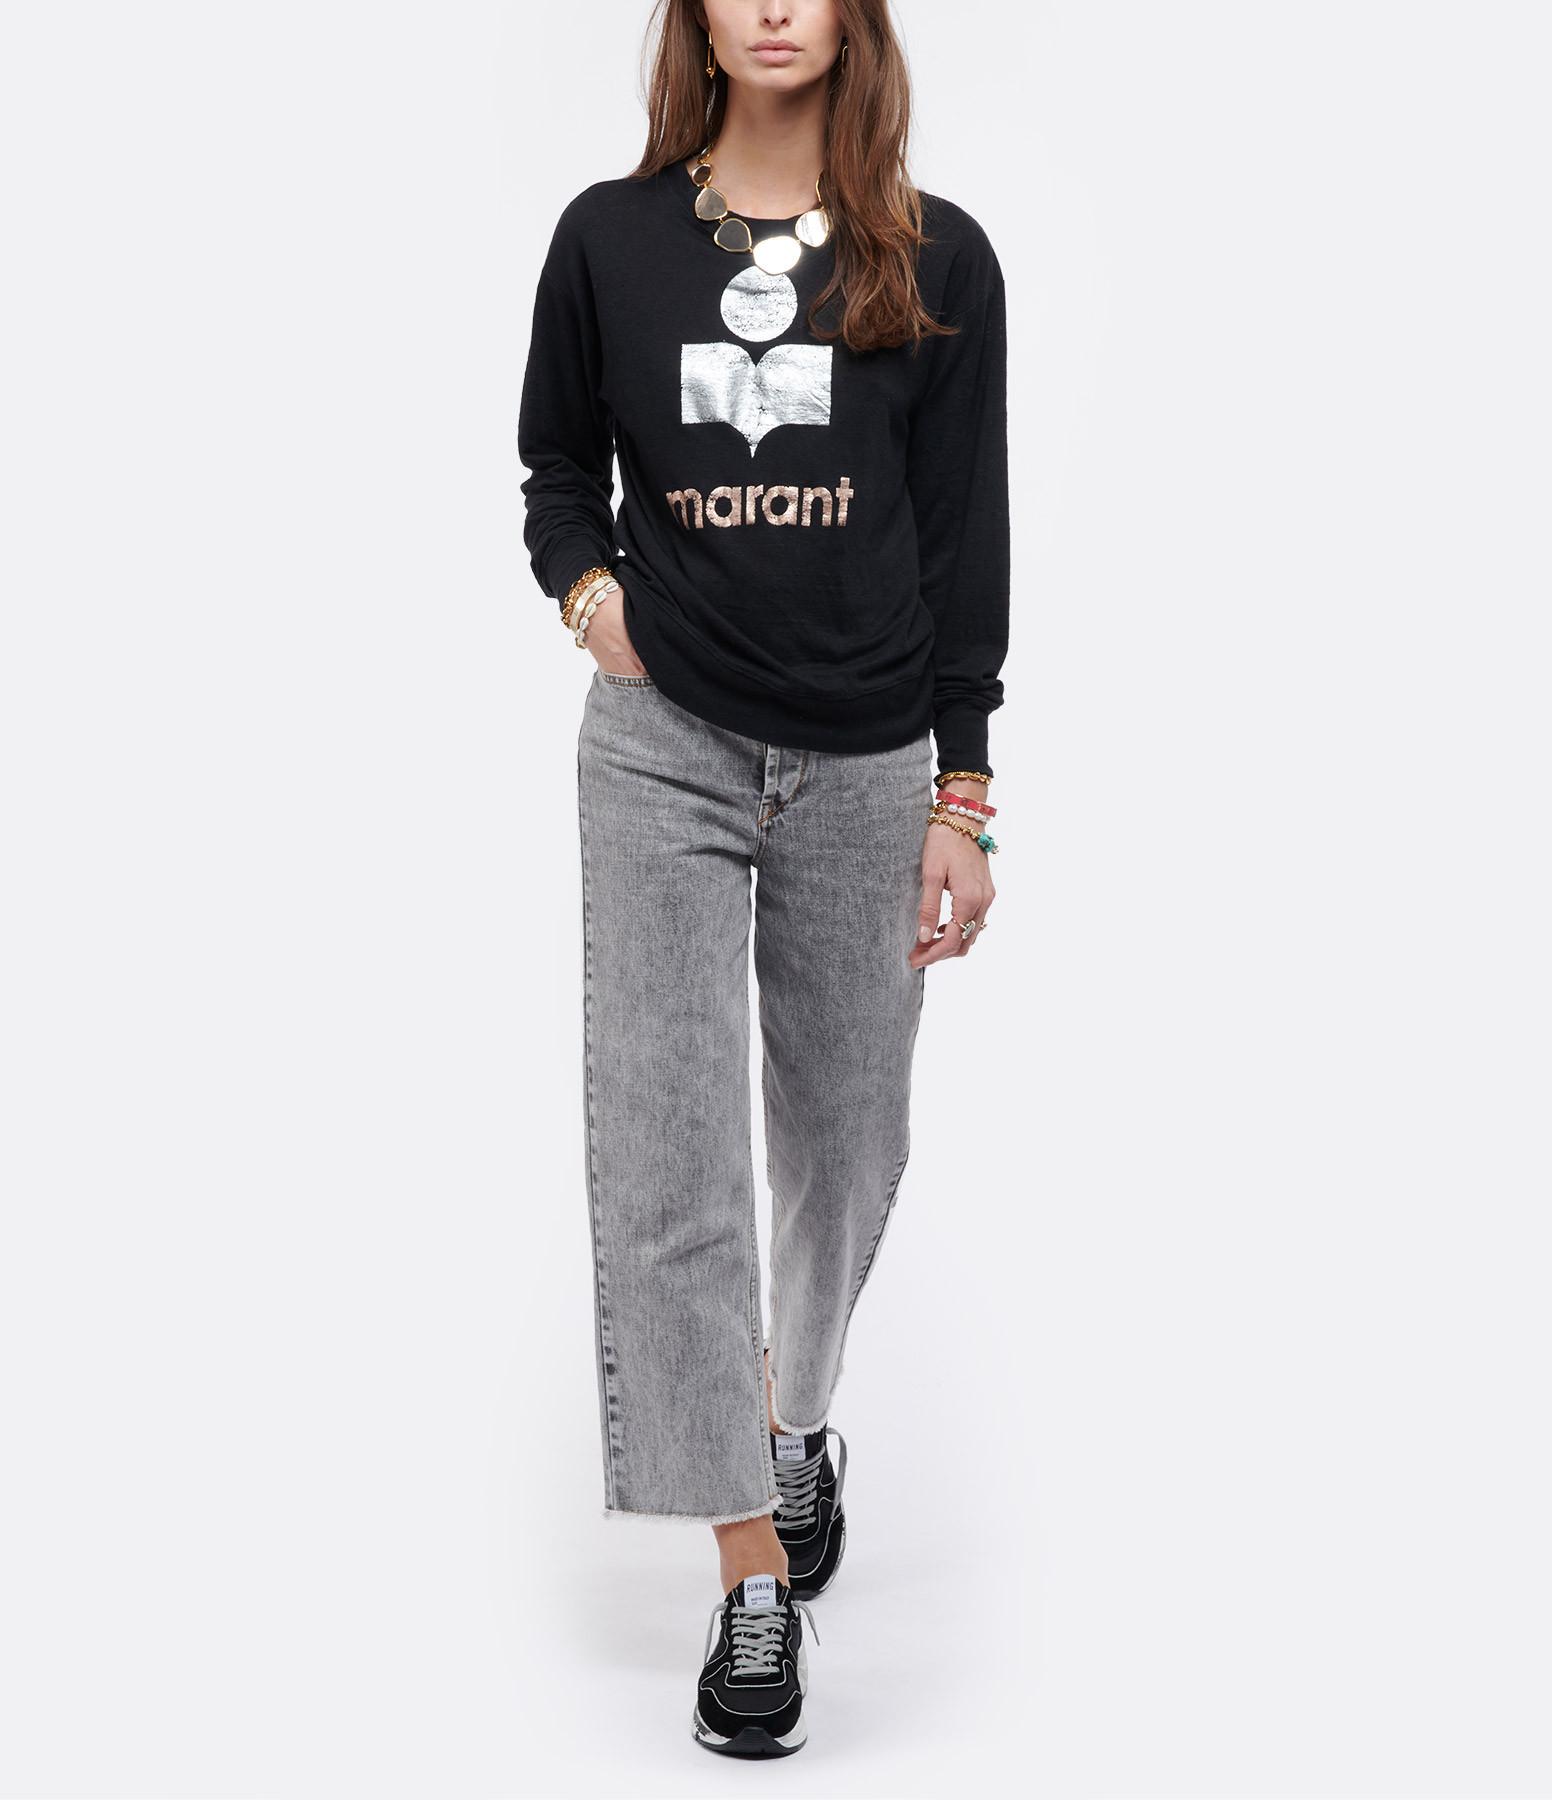 ISABEL MARANT ÉTOILE - Tee-shirt Klowia Lin Noir